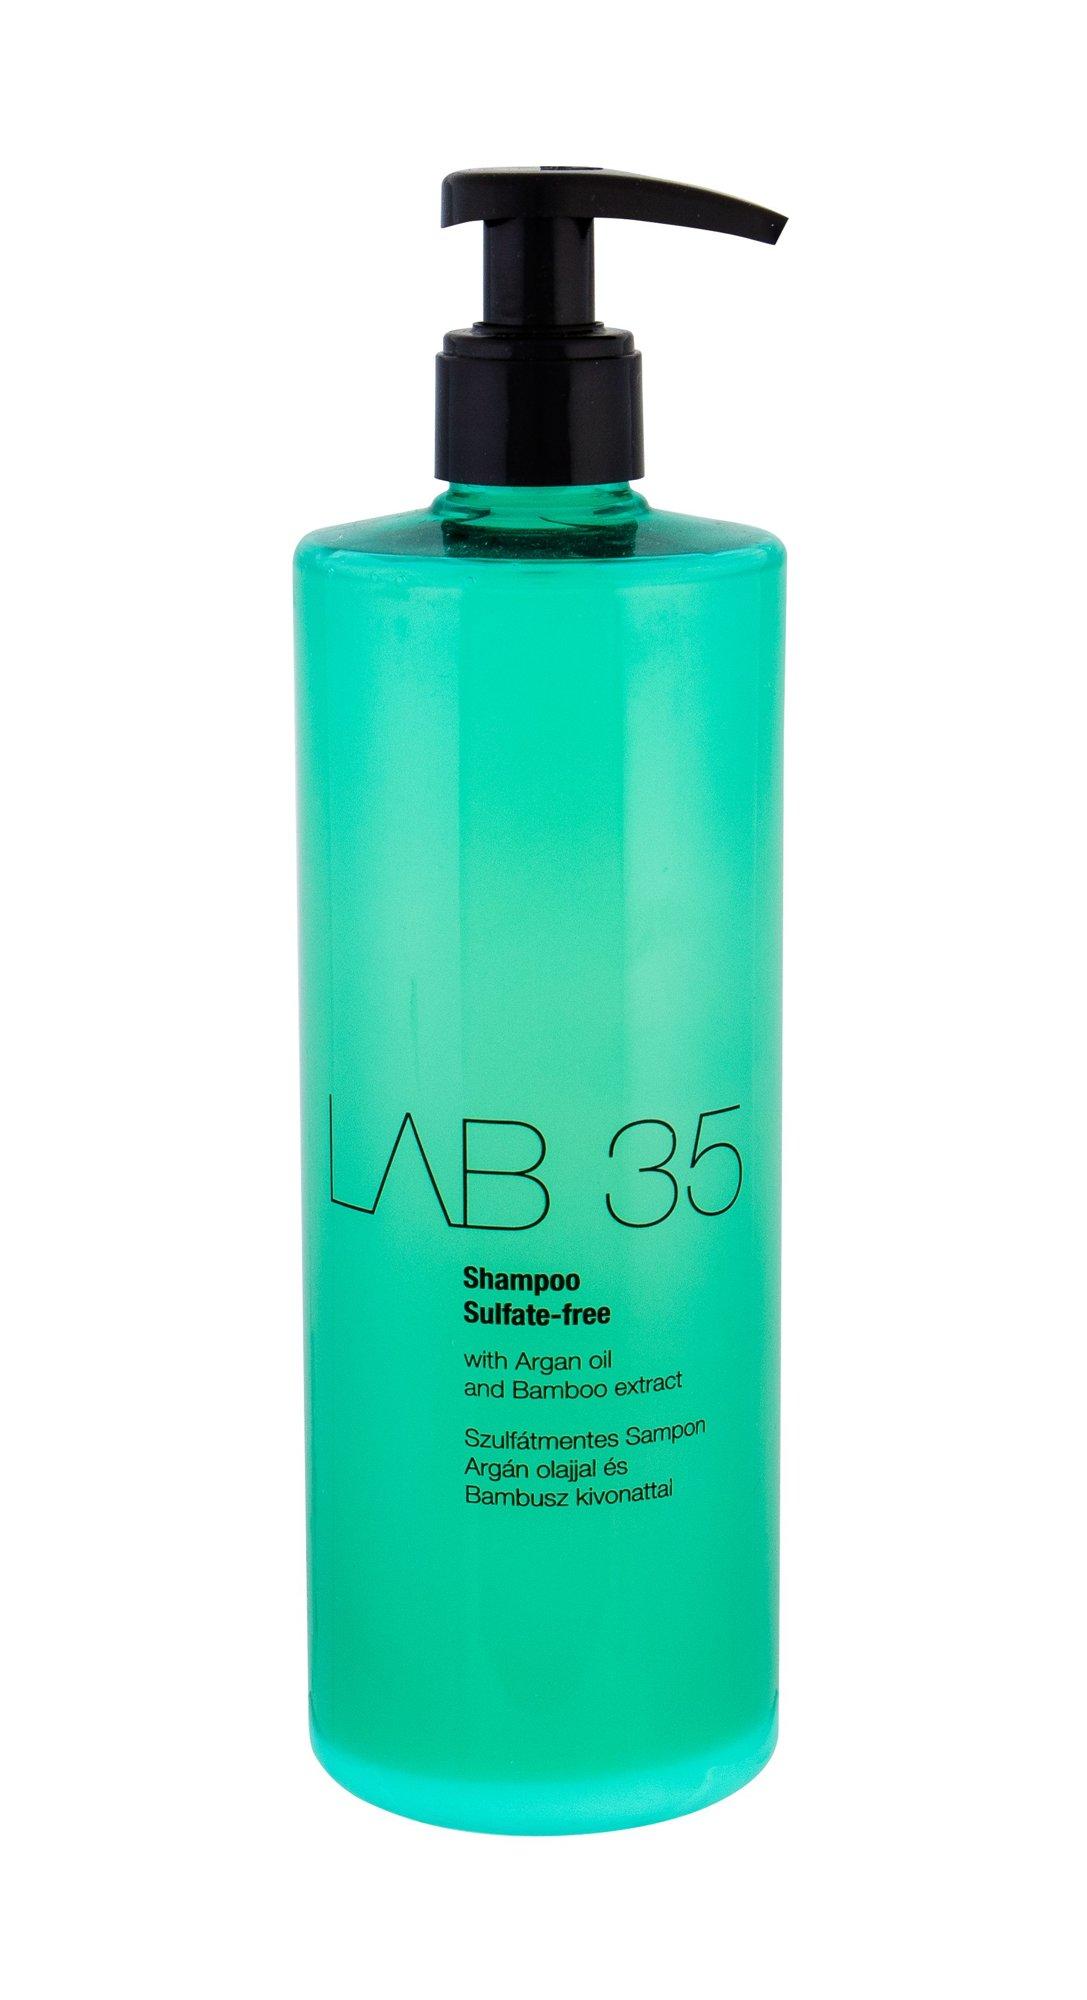 Kallos Cosmetics Lab 35 Shampoo 500ml